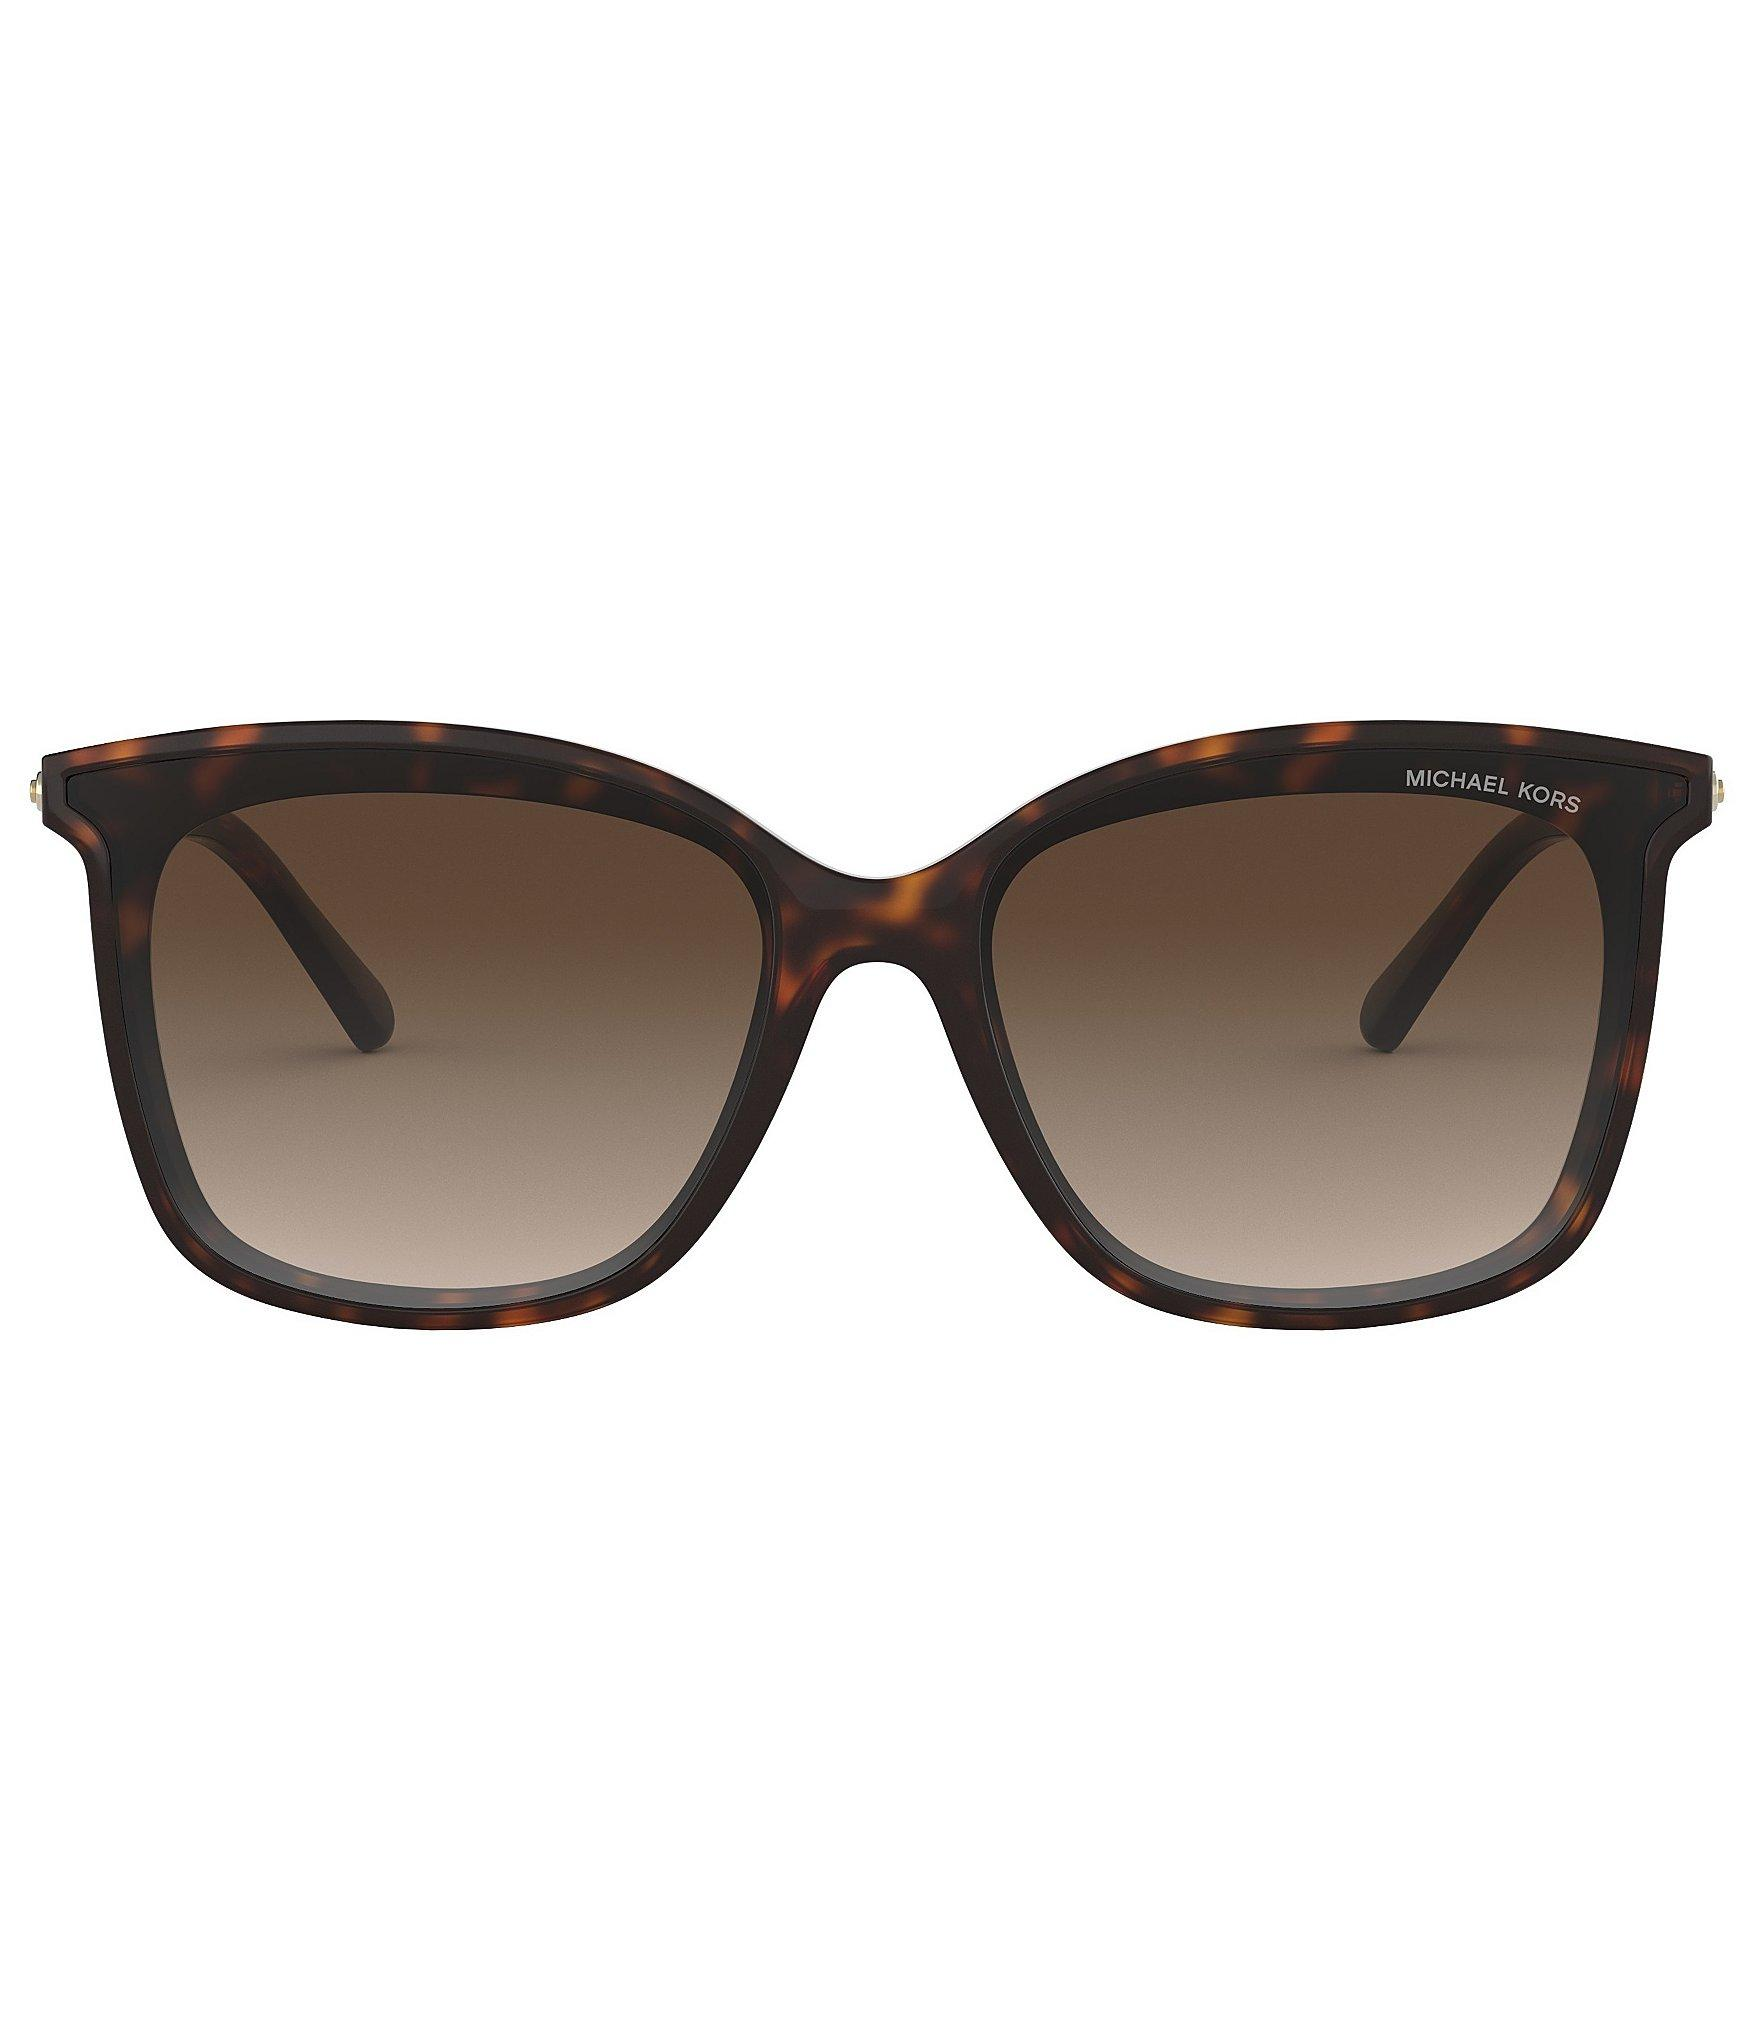 574f2fe421 Michael Kors - Brown Zermatt Sunglasses - Lyst. View fullscreen